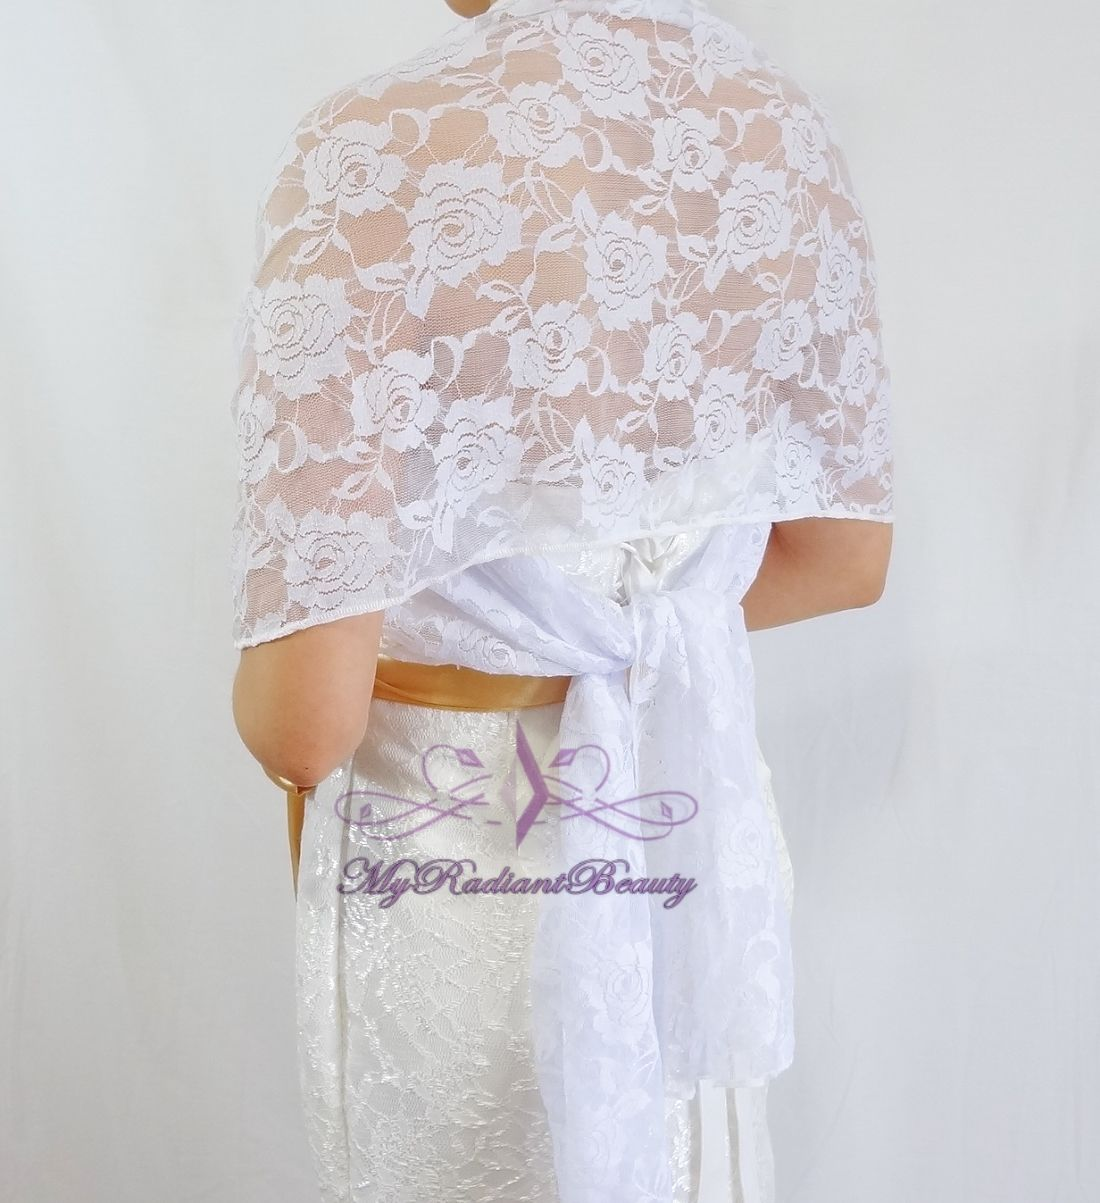 Bridal Lace Wrap Stole, White Lace Shawl, Bridal Silk Lace